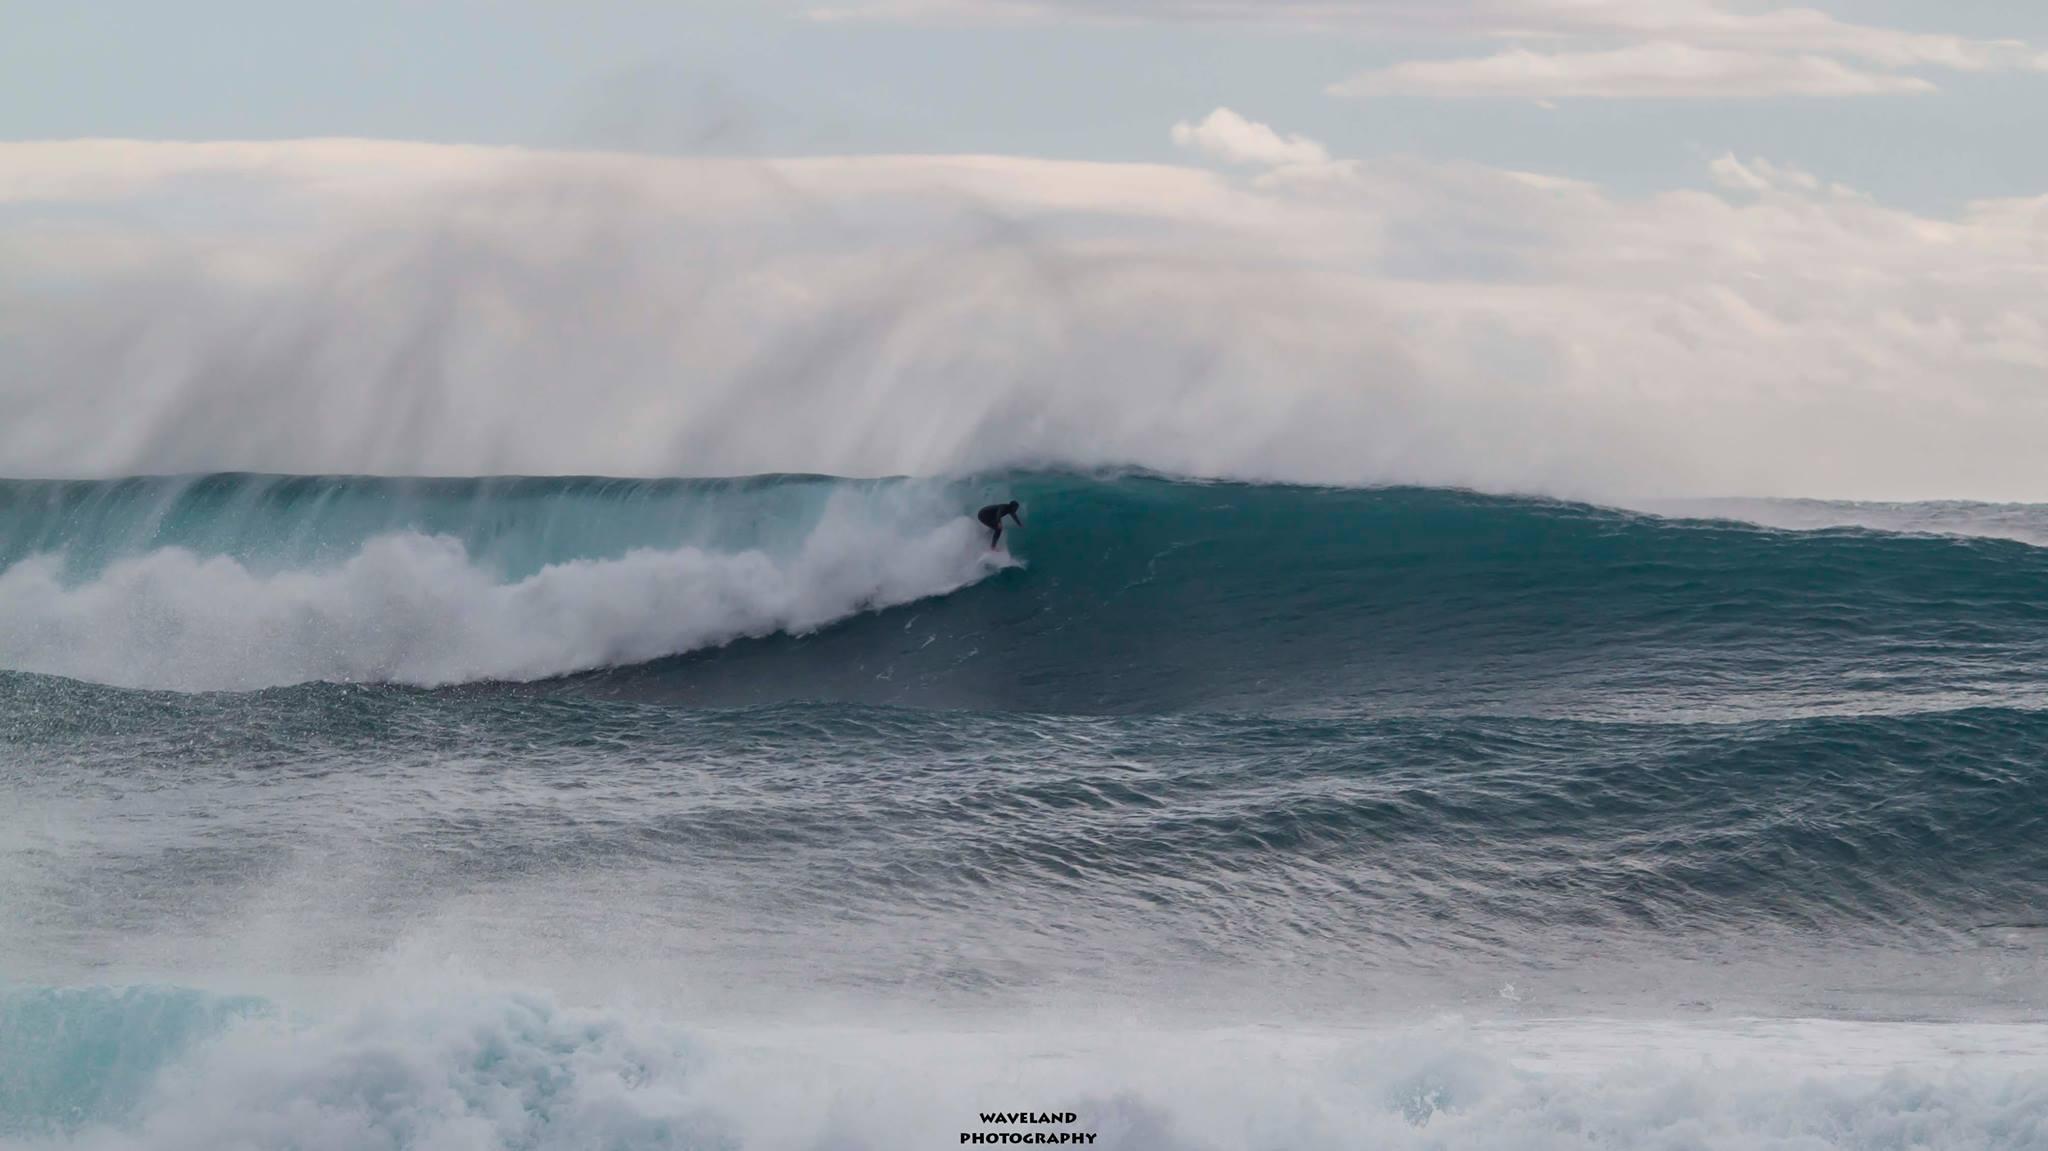 surfing in greece